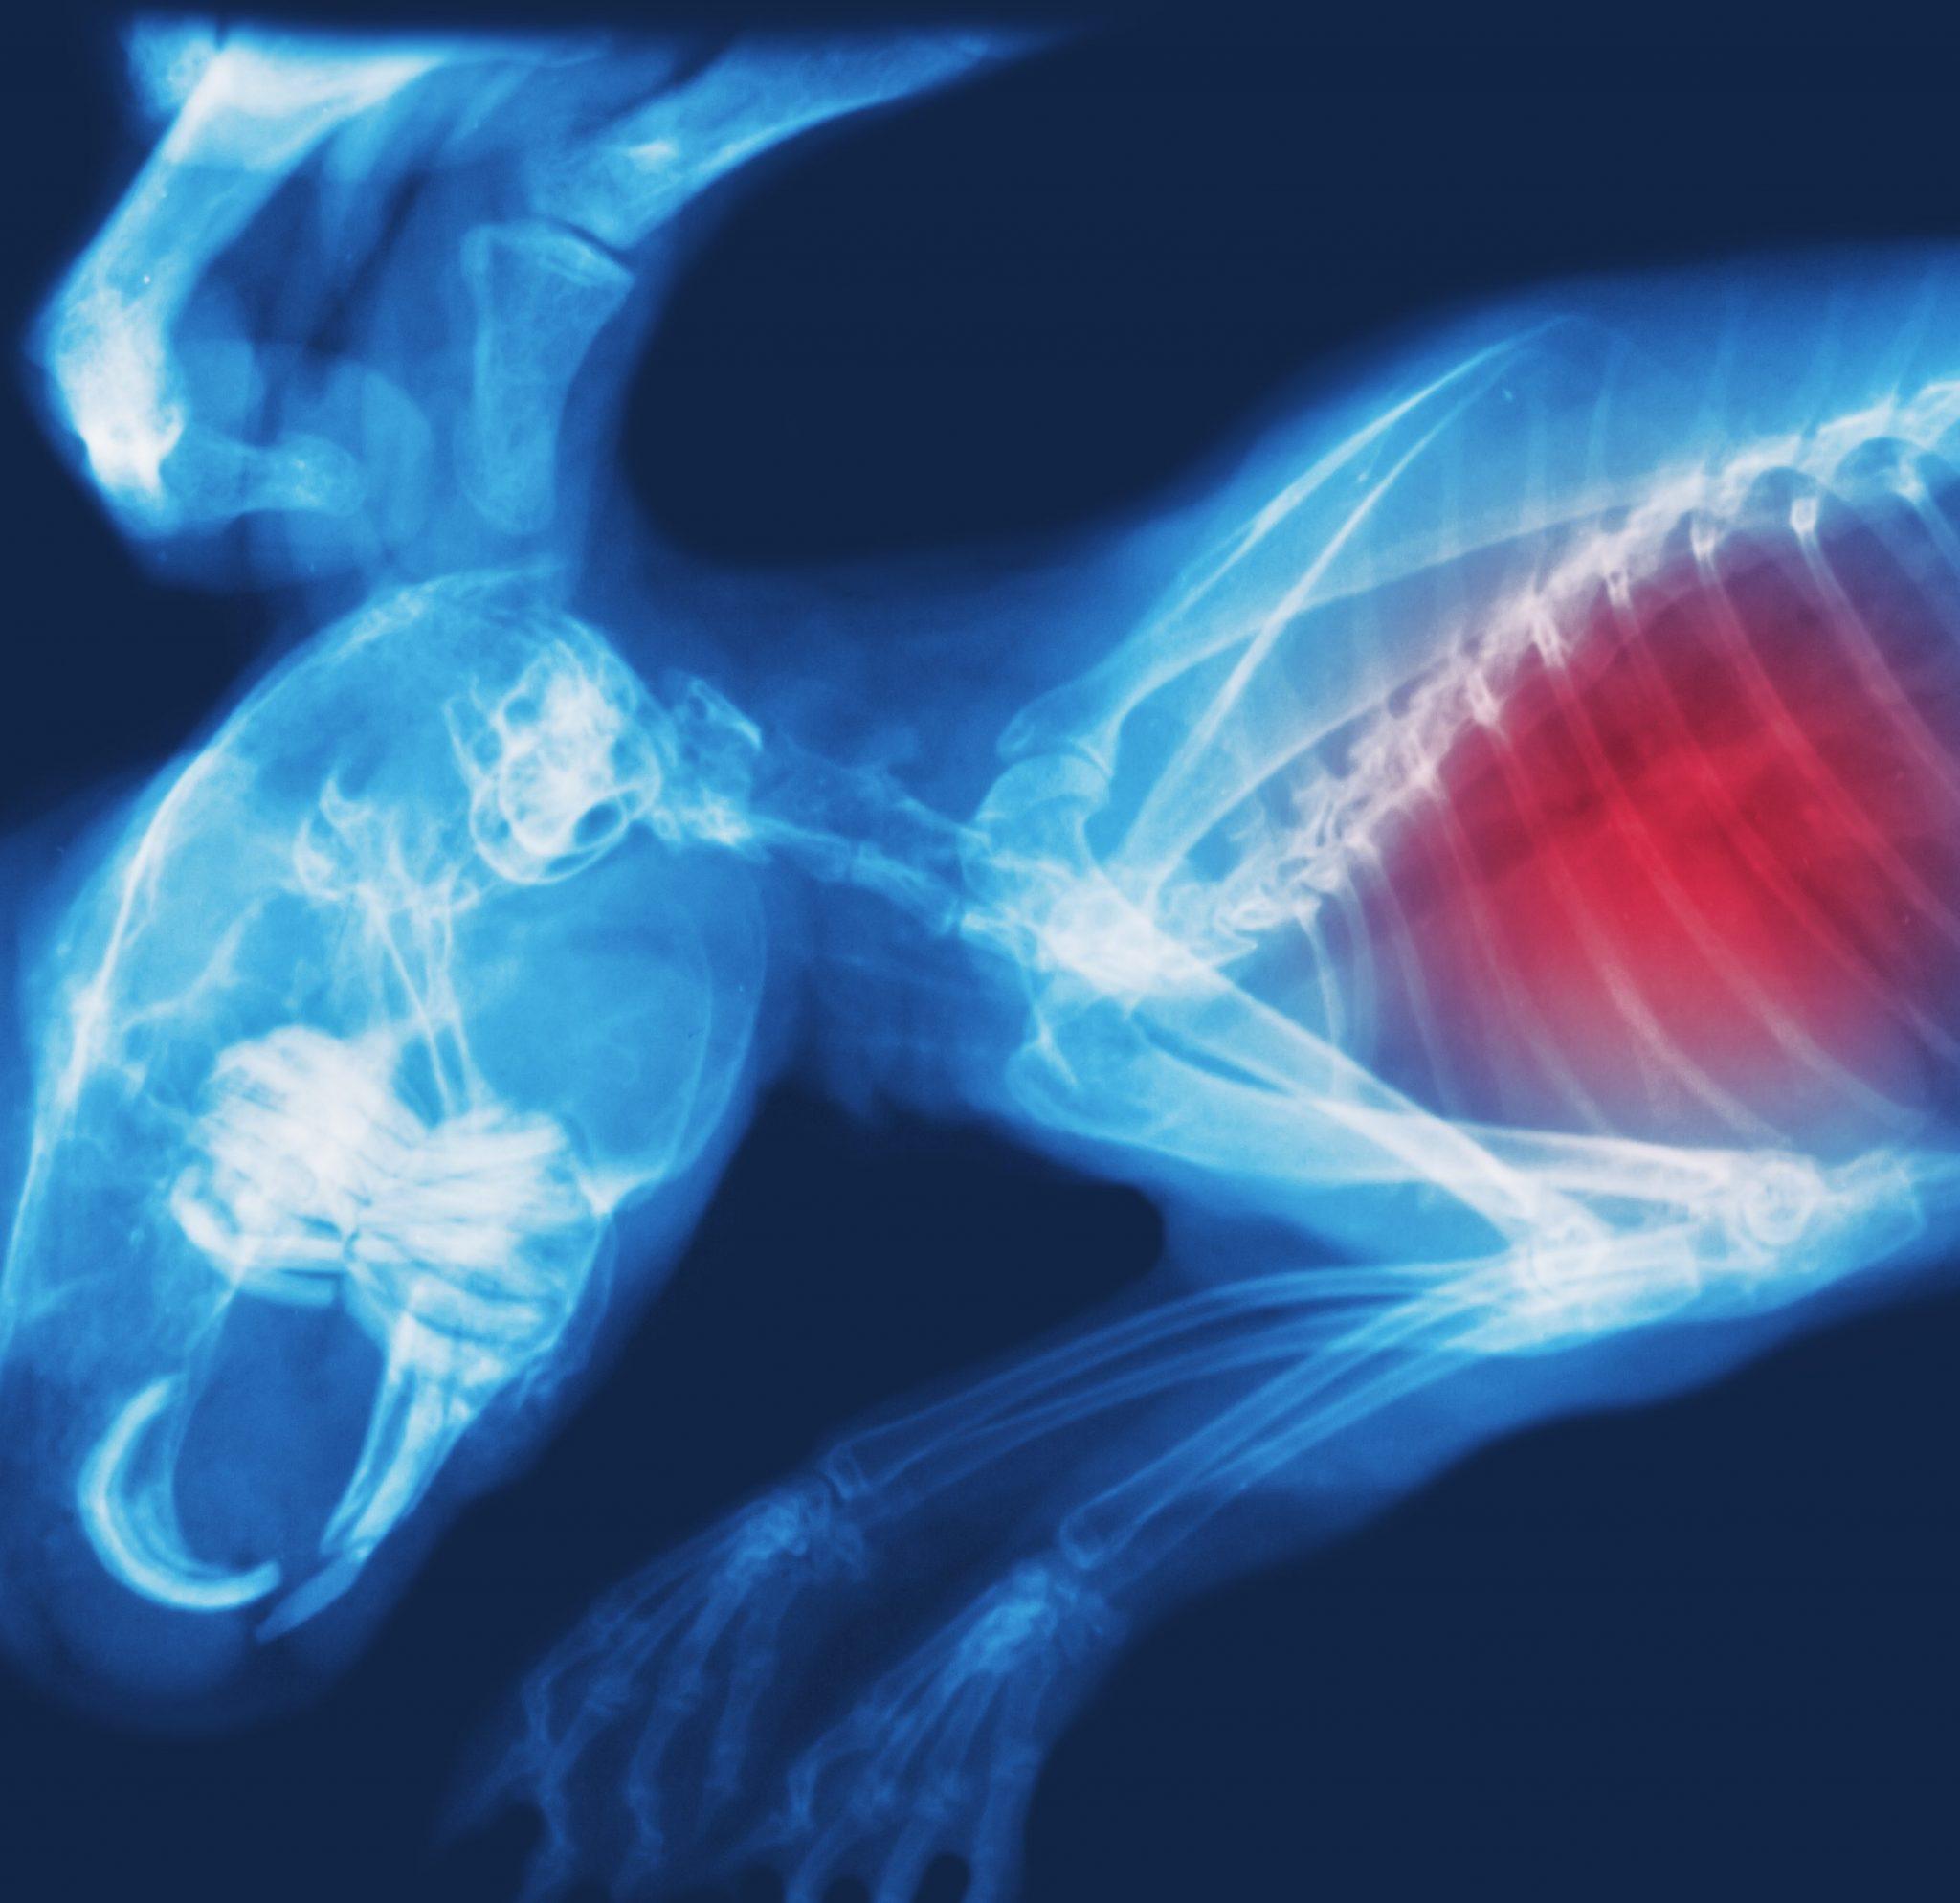 molecular imaging in toxicology studies